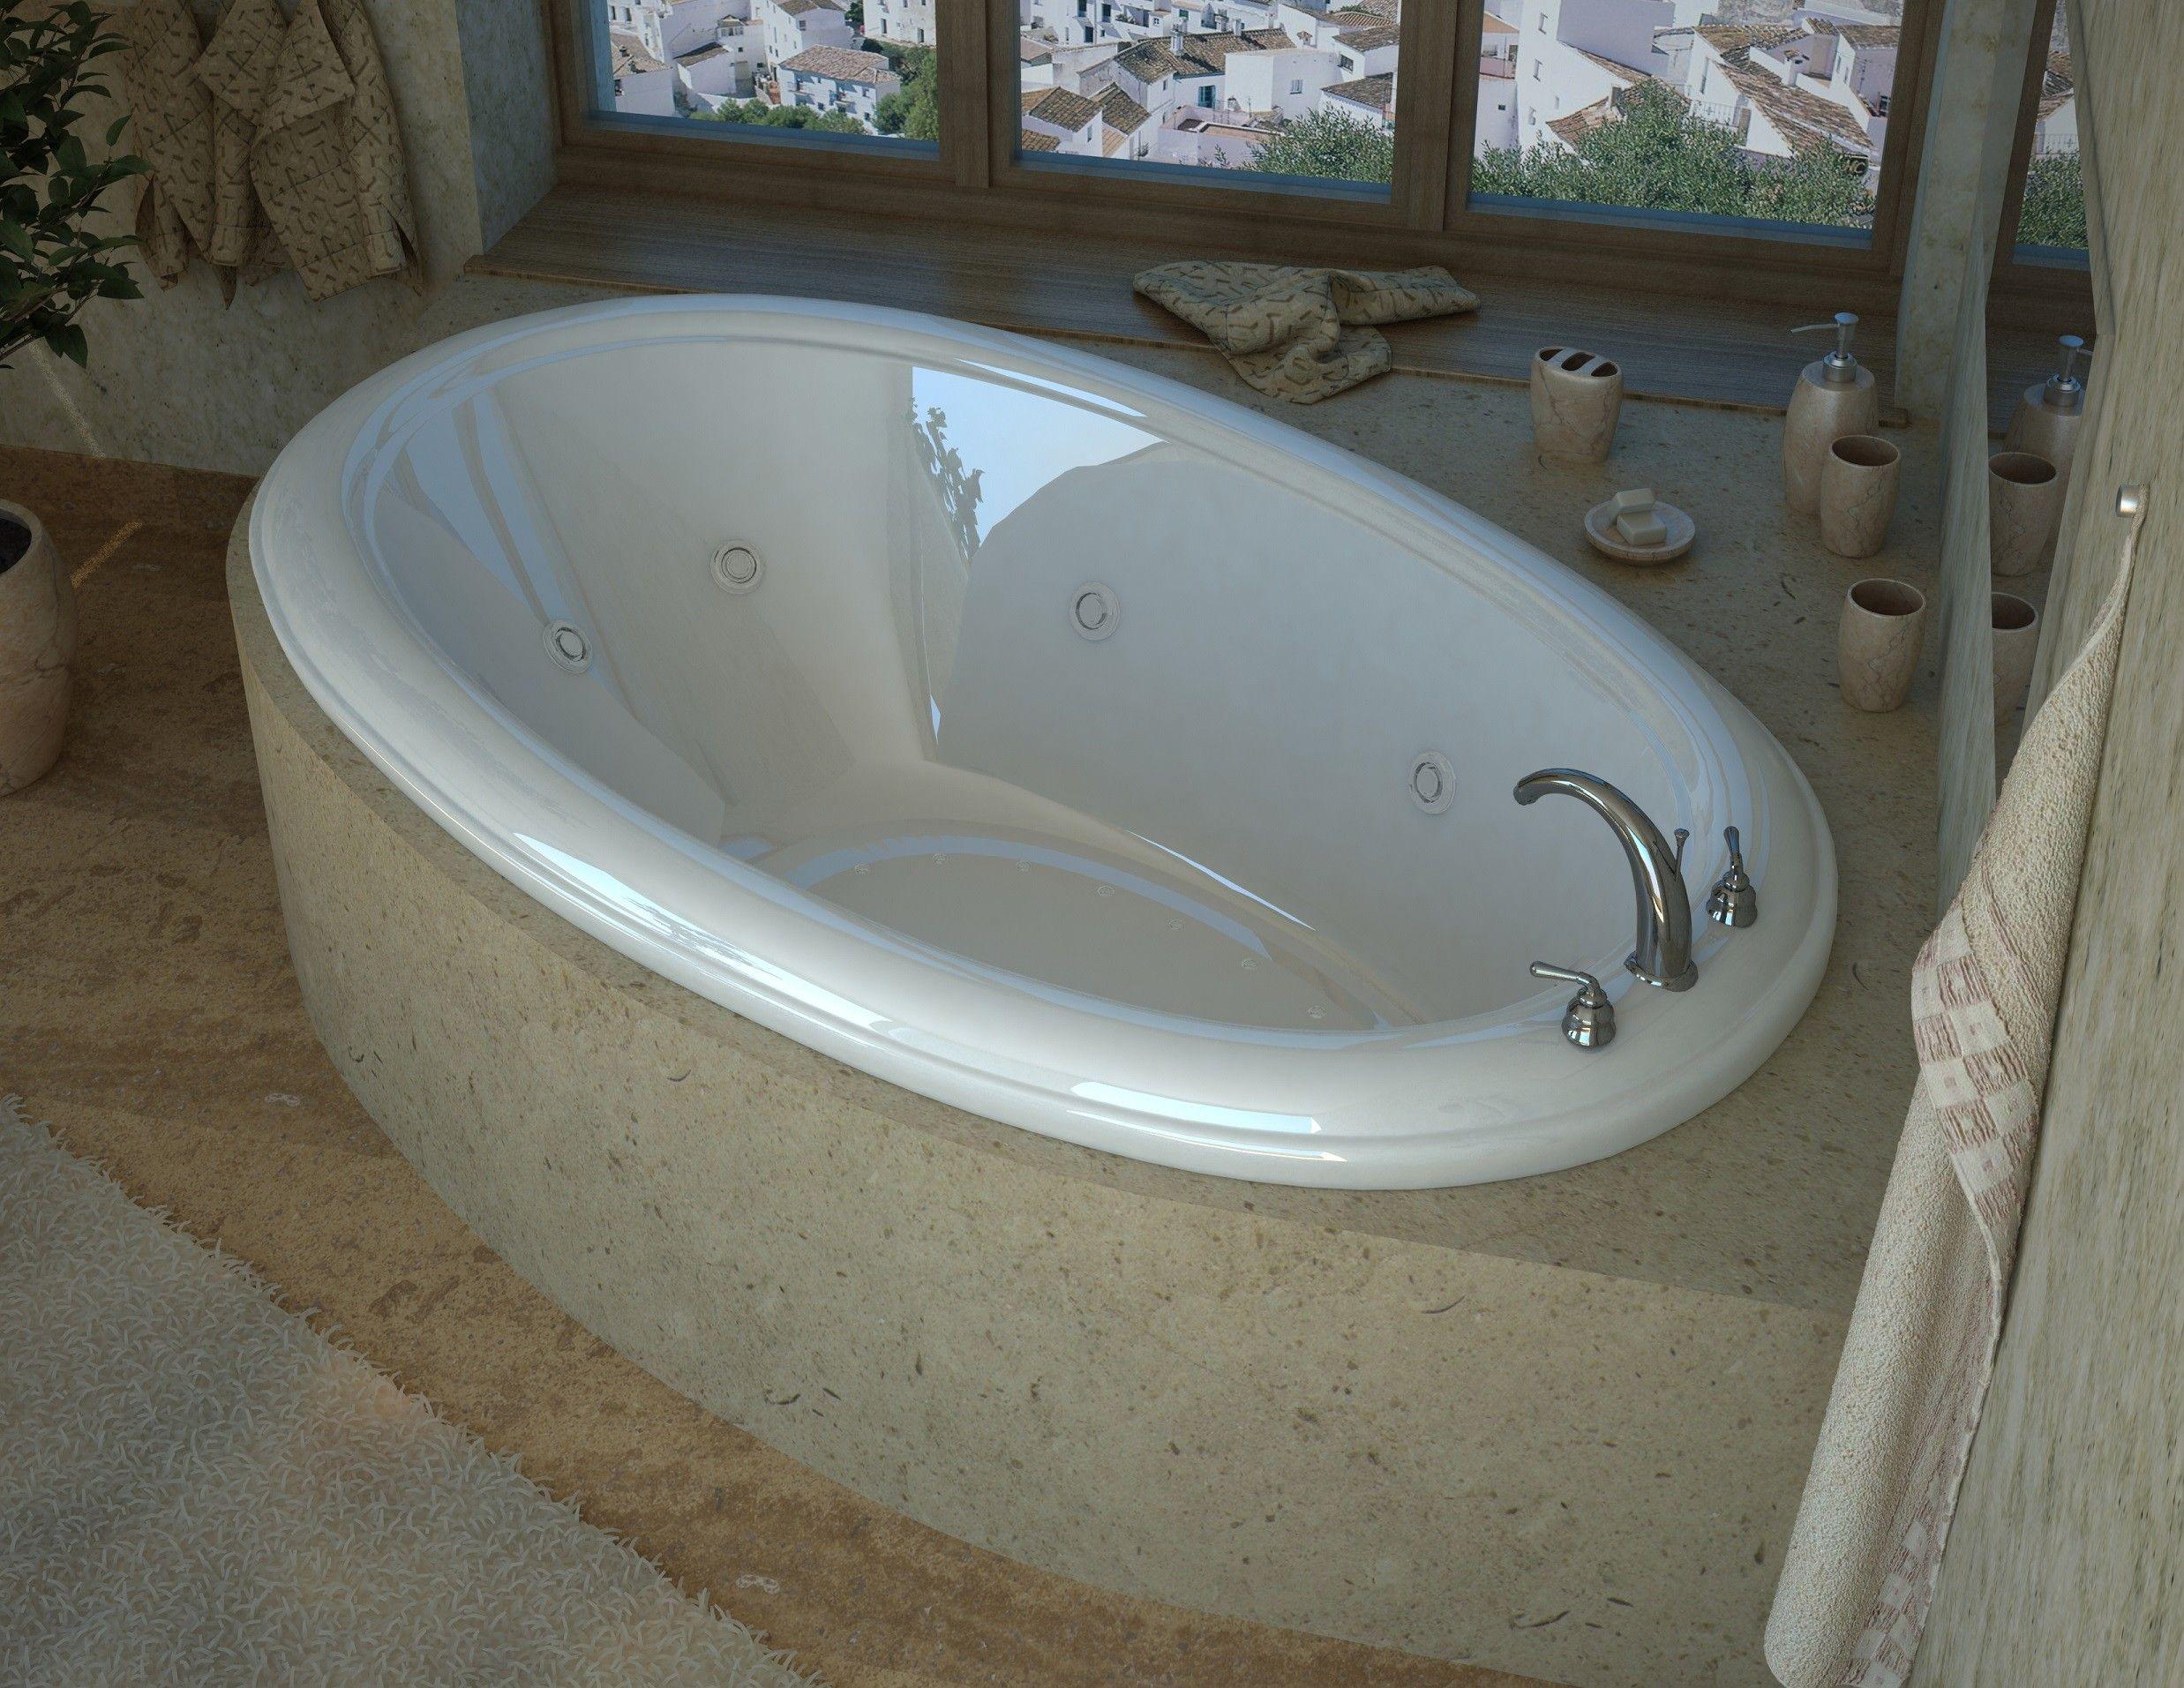 capri rectangular bathtubs caresse tubs soaker venzi all bathtub soaking x